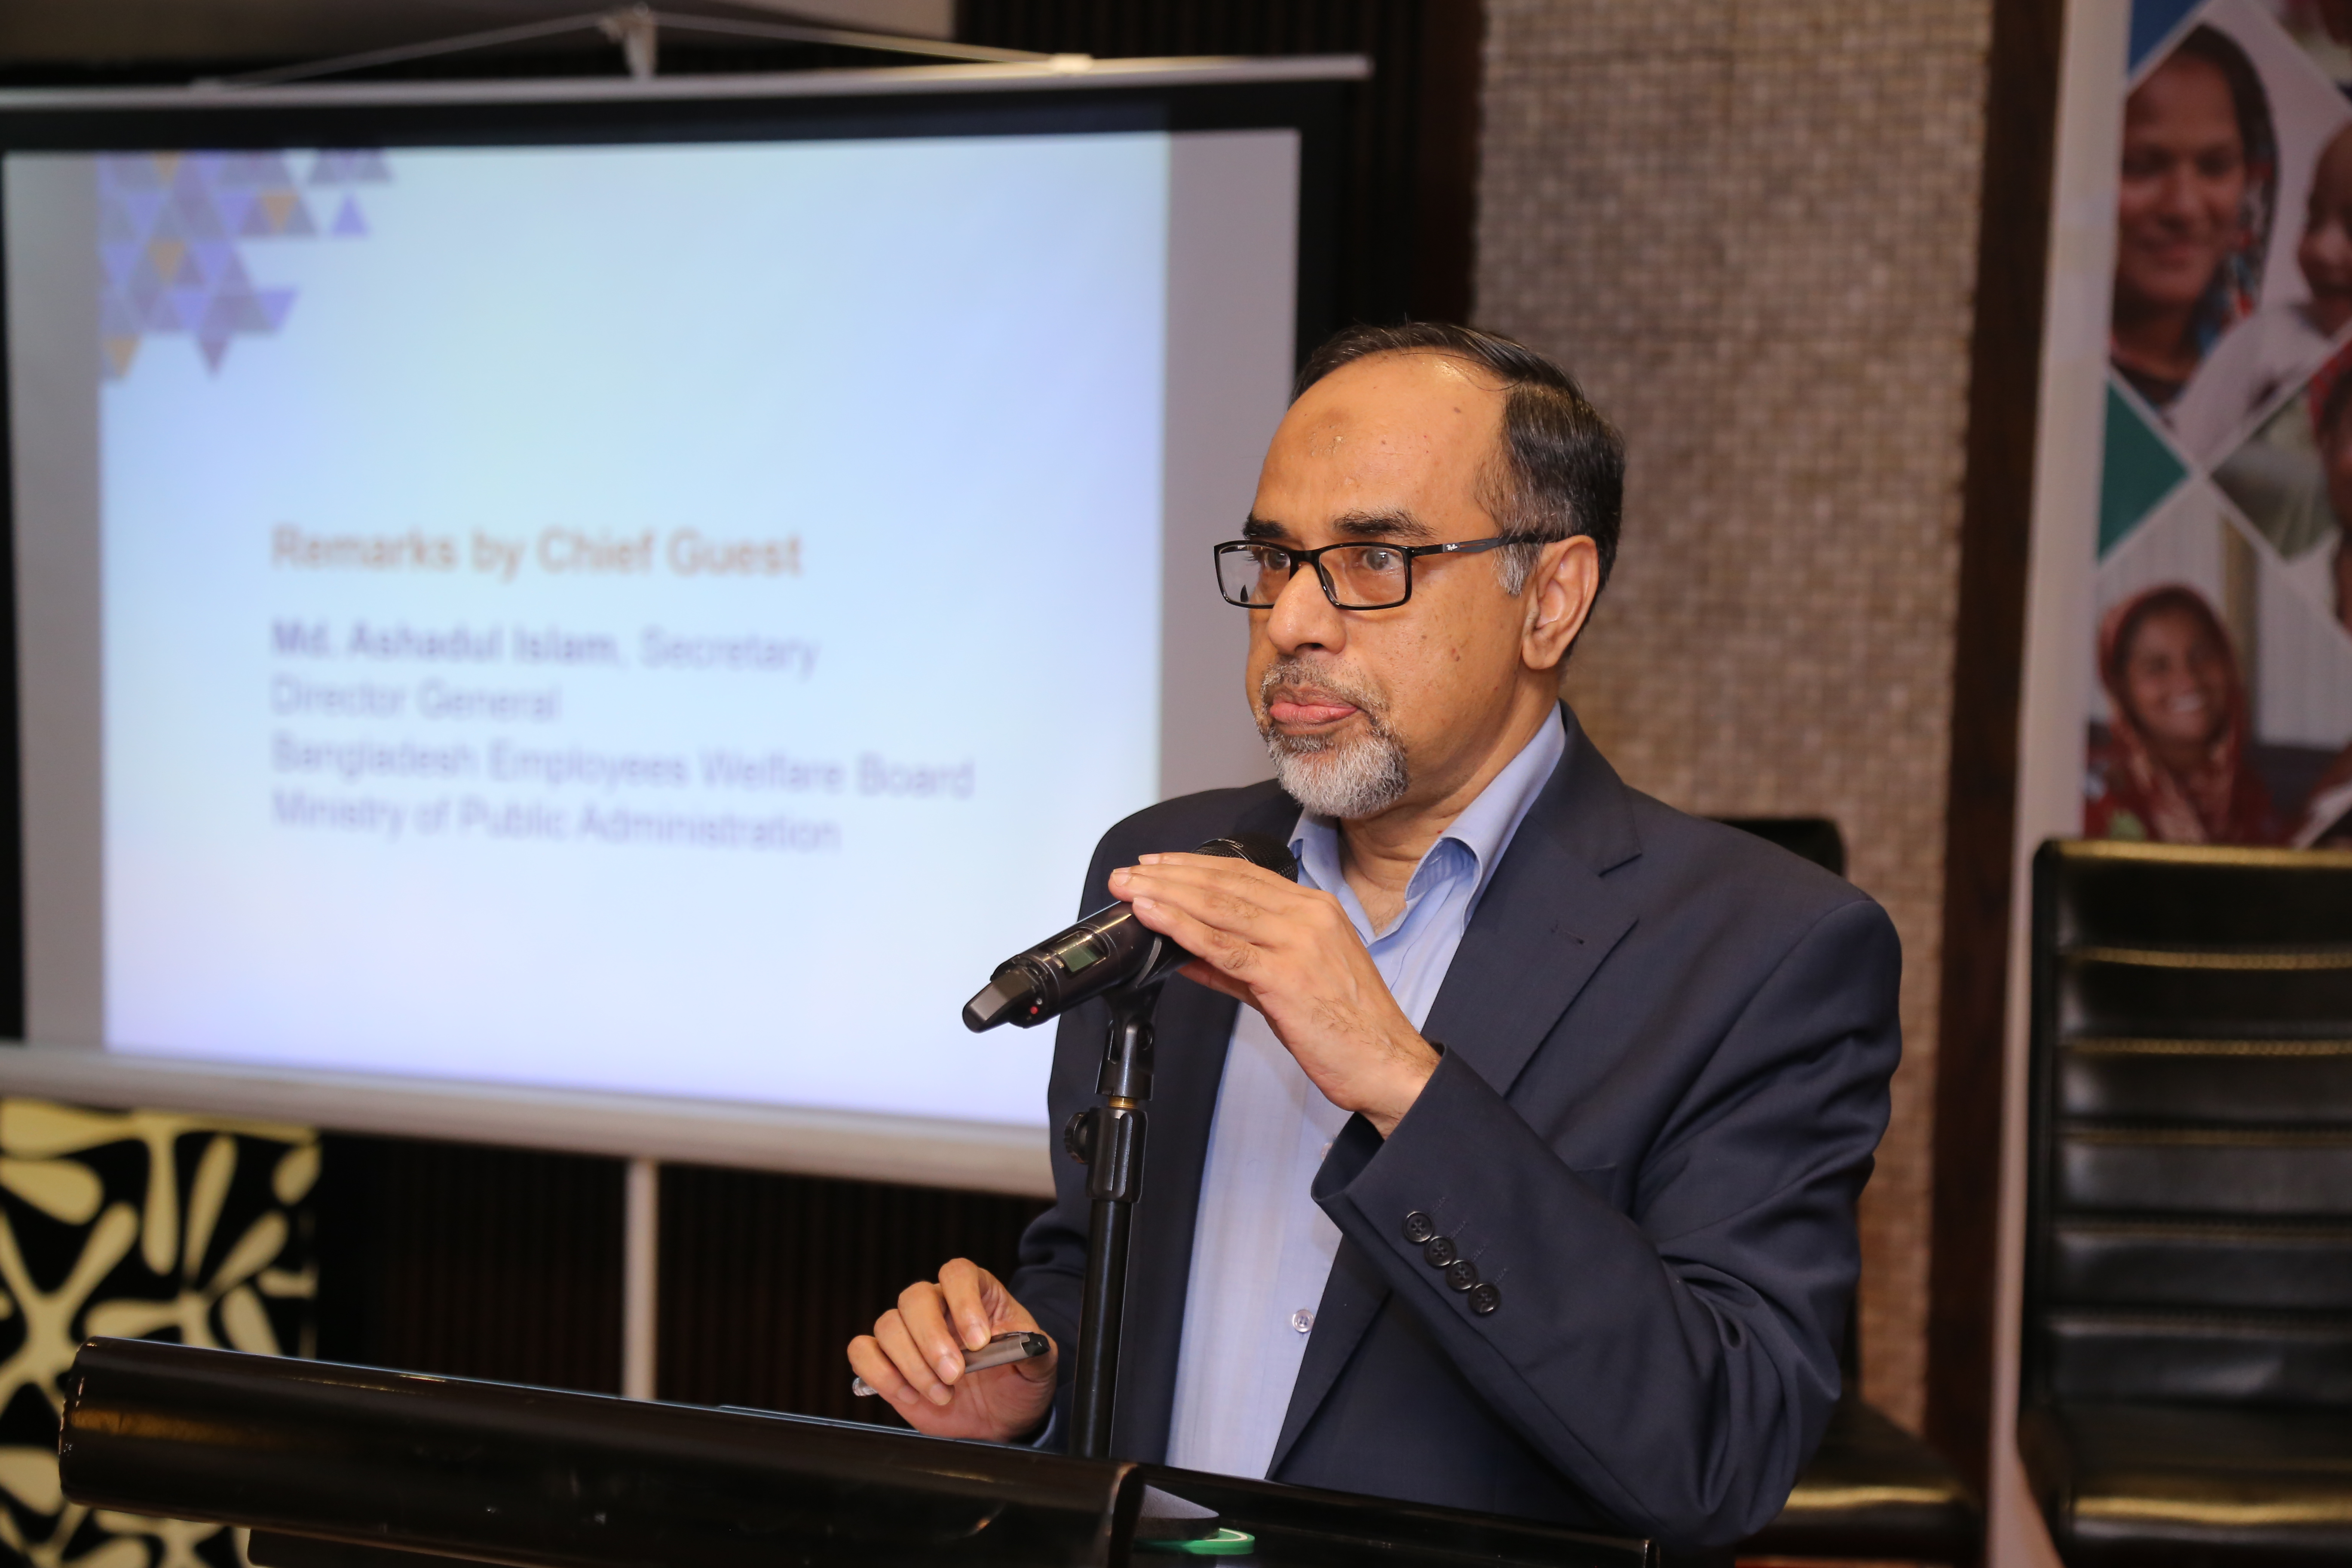 Chief Guest - Mr. Md. Ashadul Islam, Secretary of Government of Bangladesh